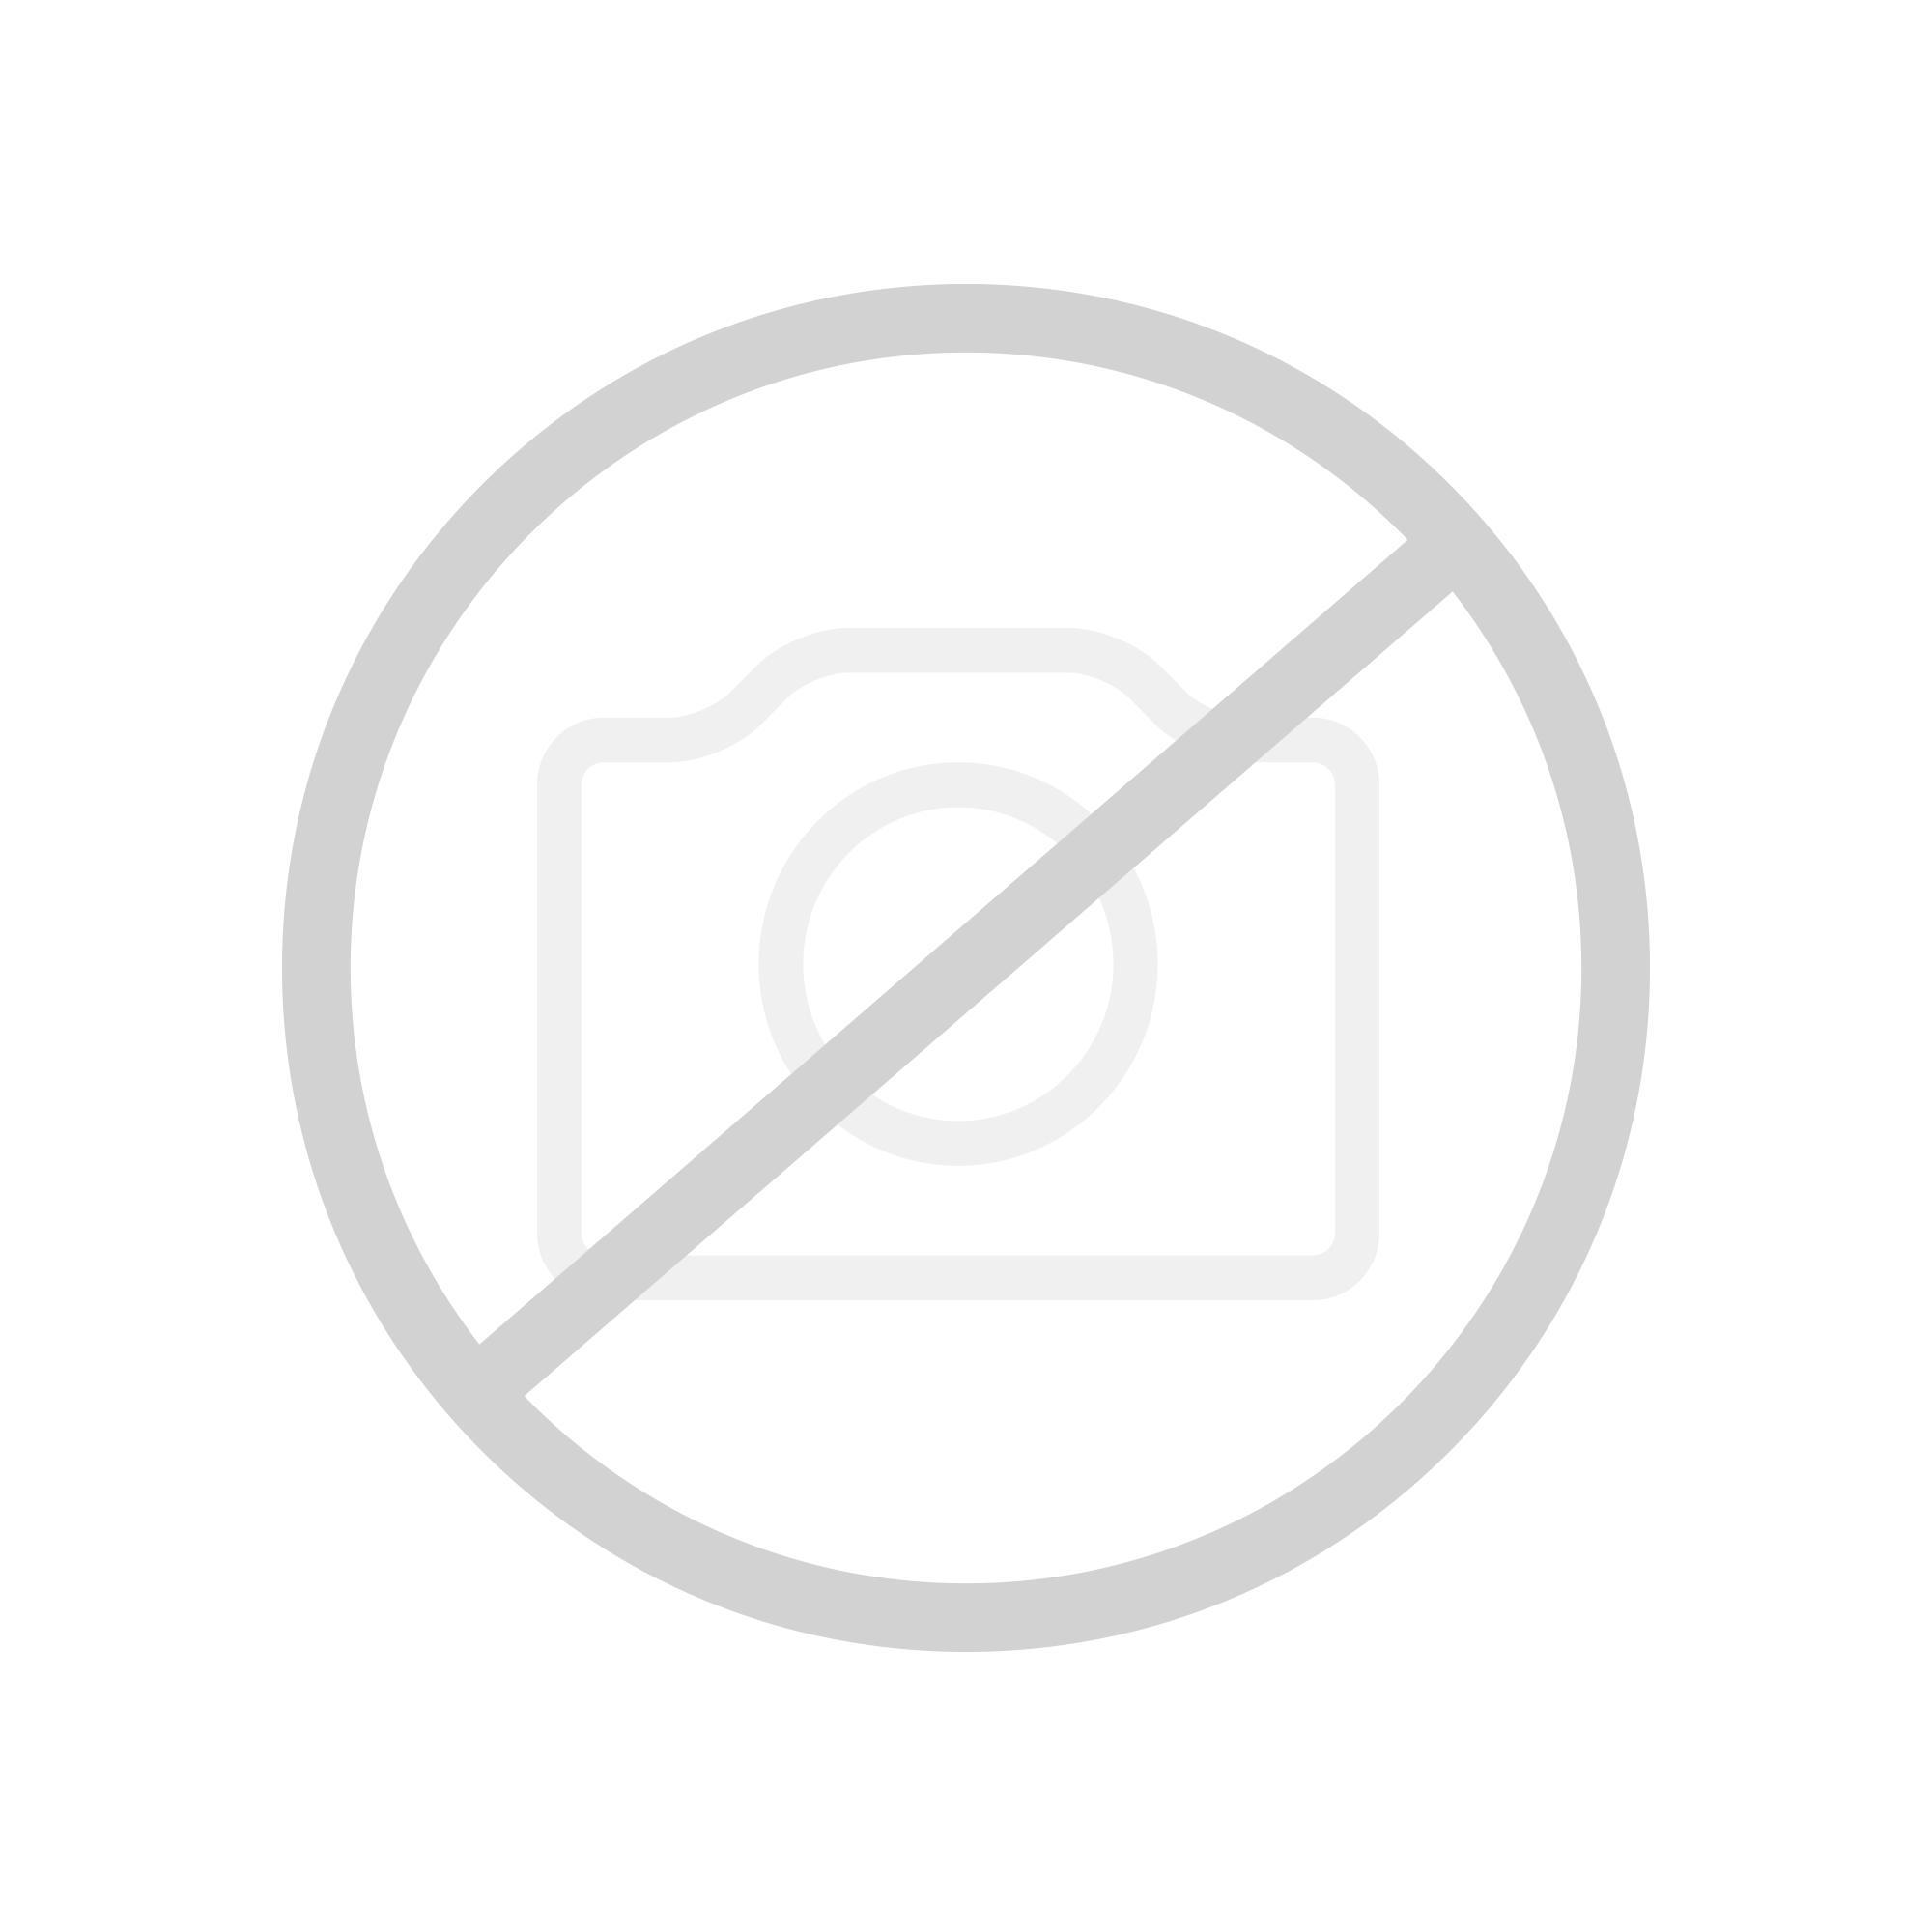 Victoria + Albert Kit 20 verschließbares Ablaufventil chrom